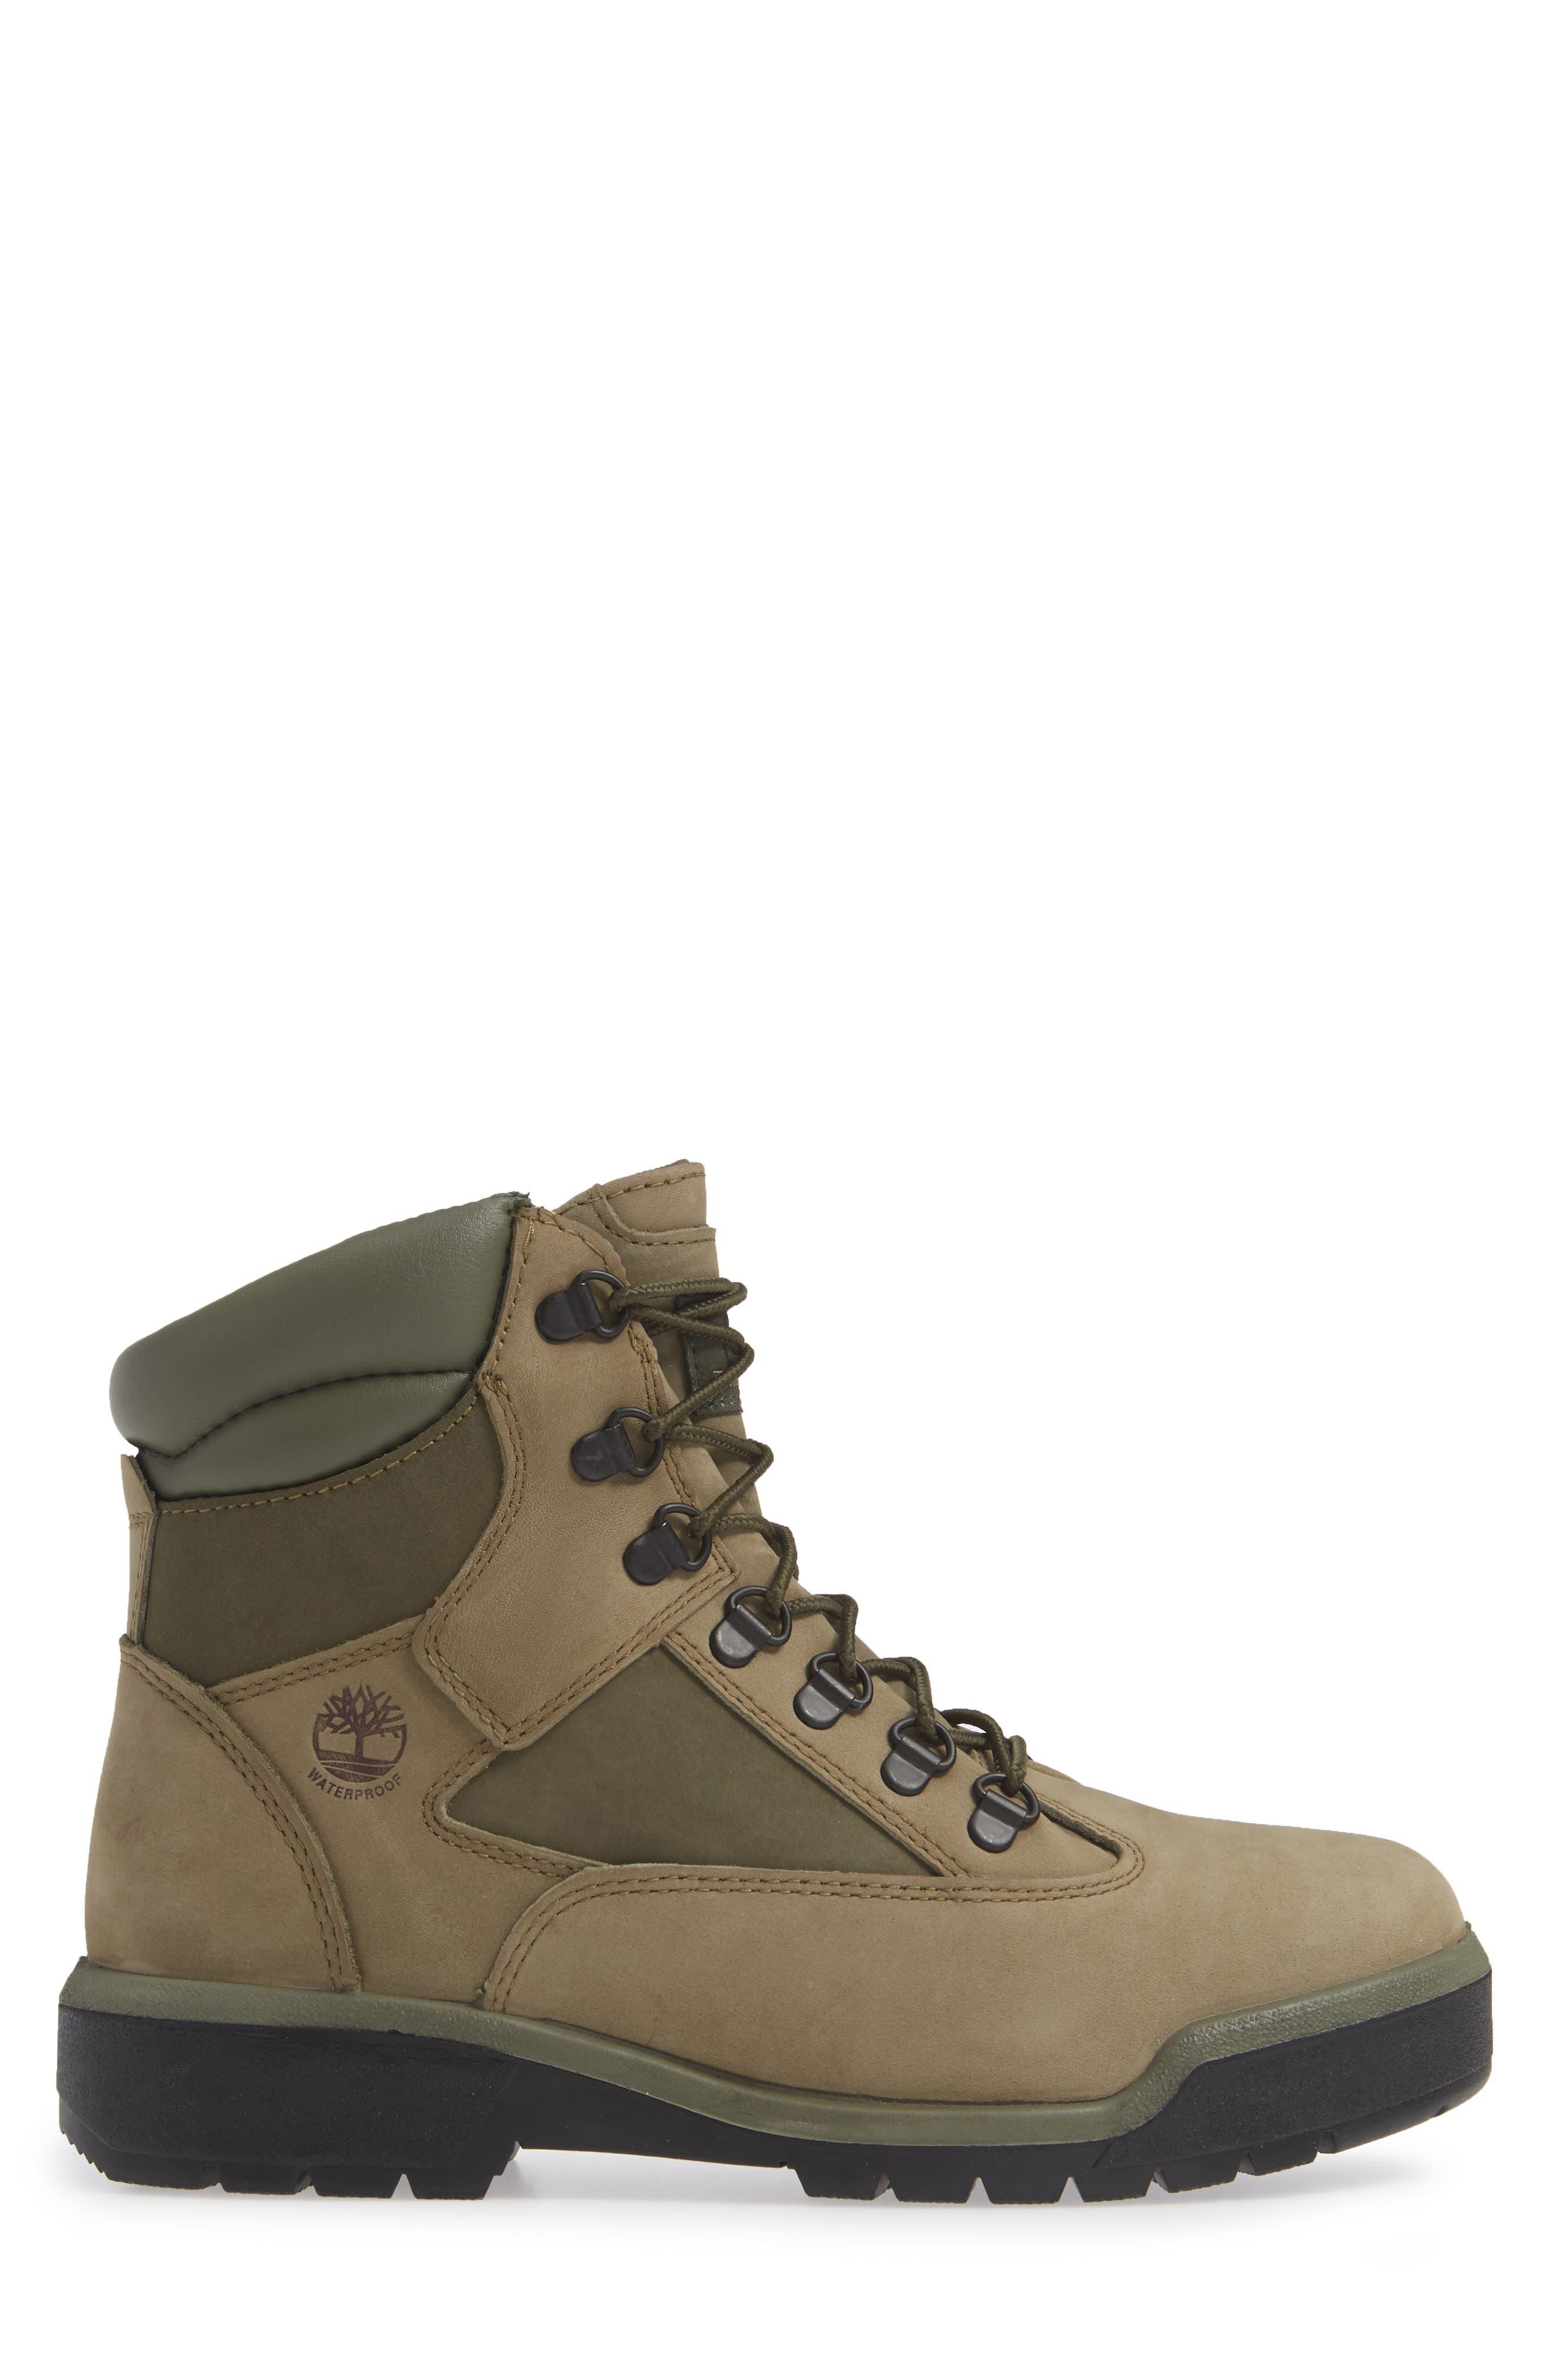 Field Waterproof Boot,                             Alternate thumbnail 3, color,                             280